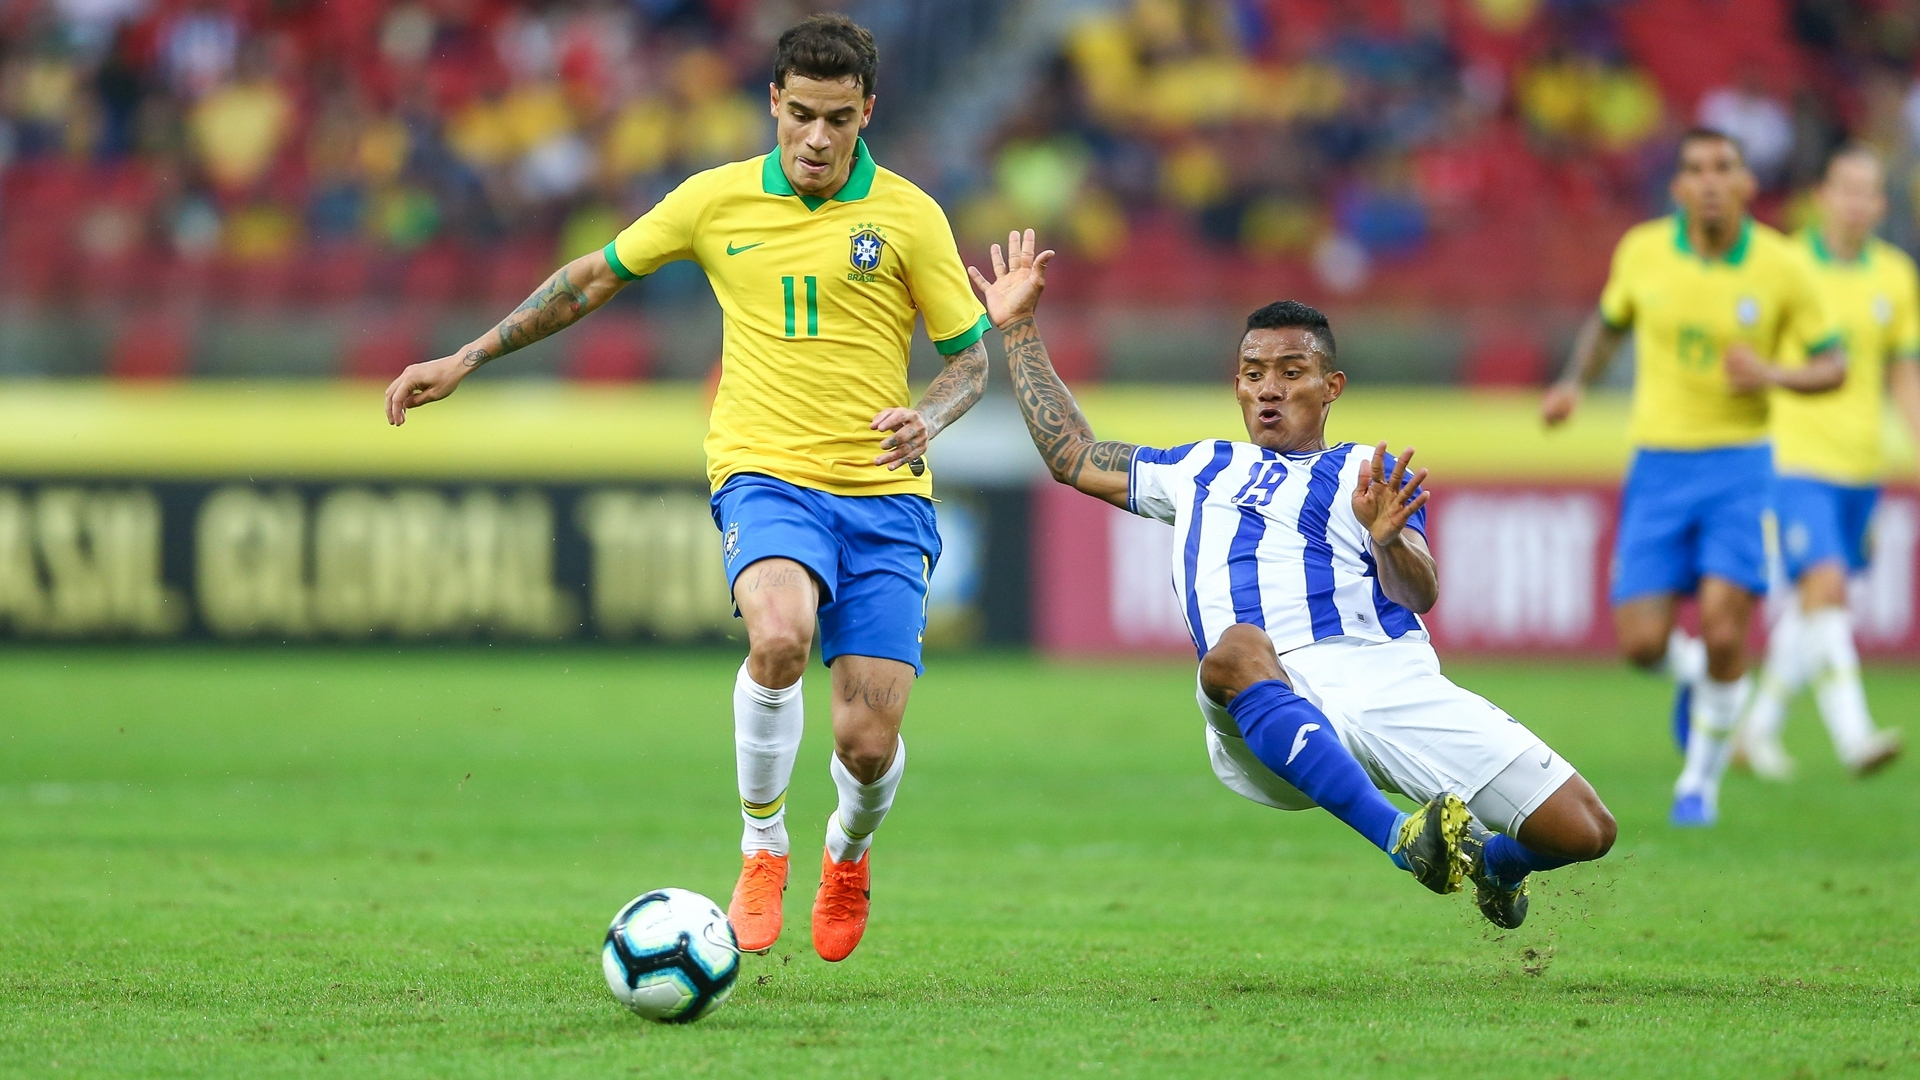 Brazil prepare to take on South America's best in Copa America 2019.